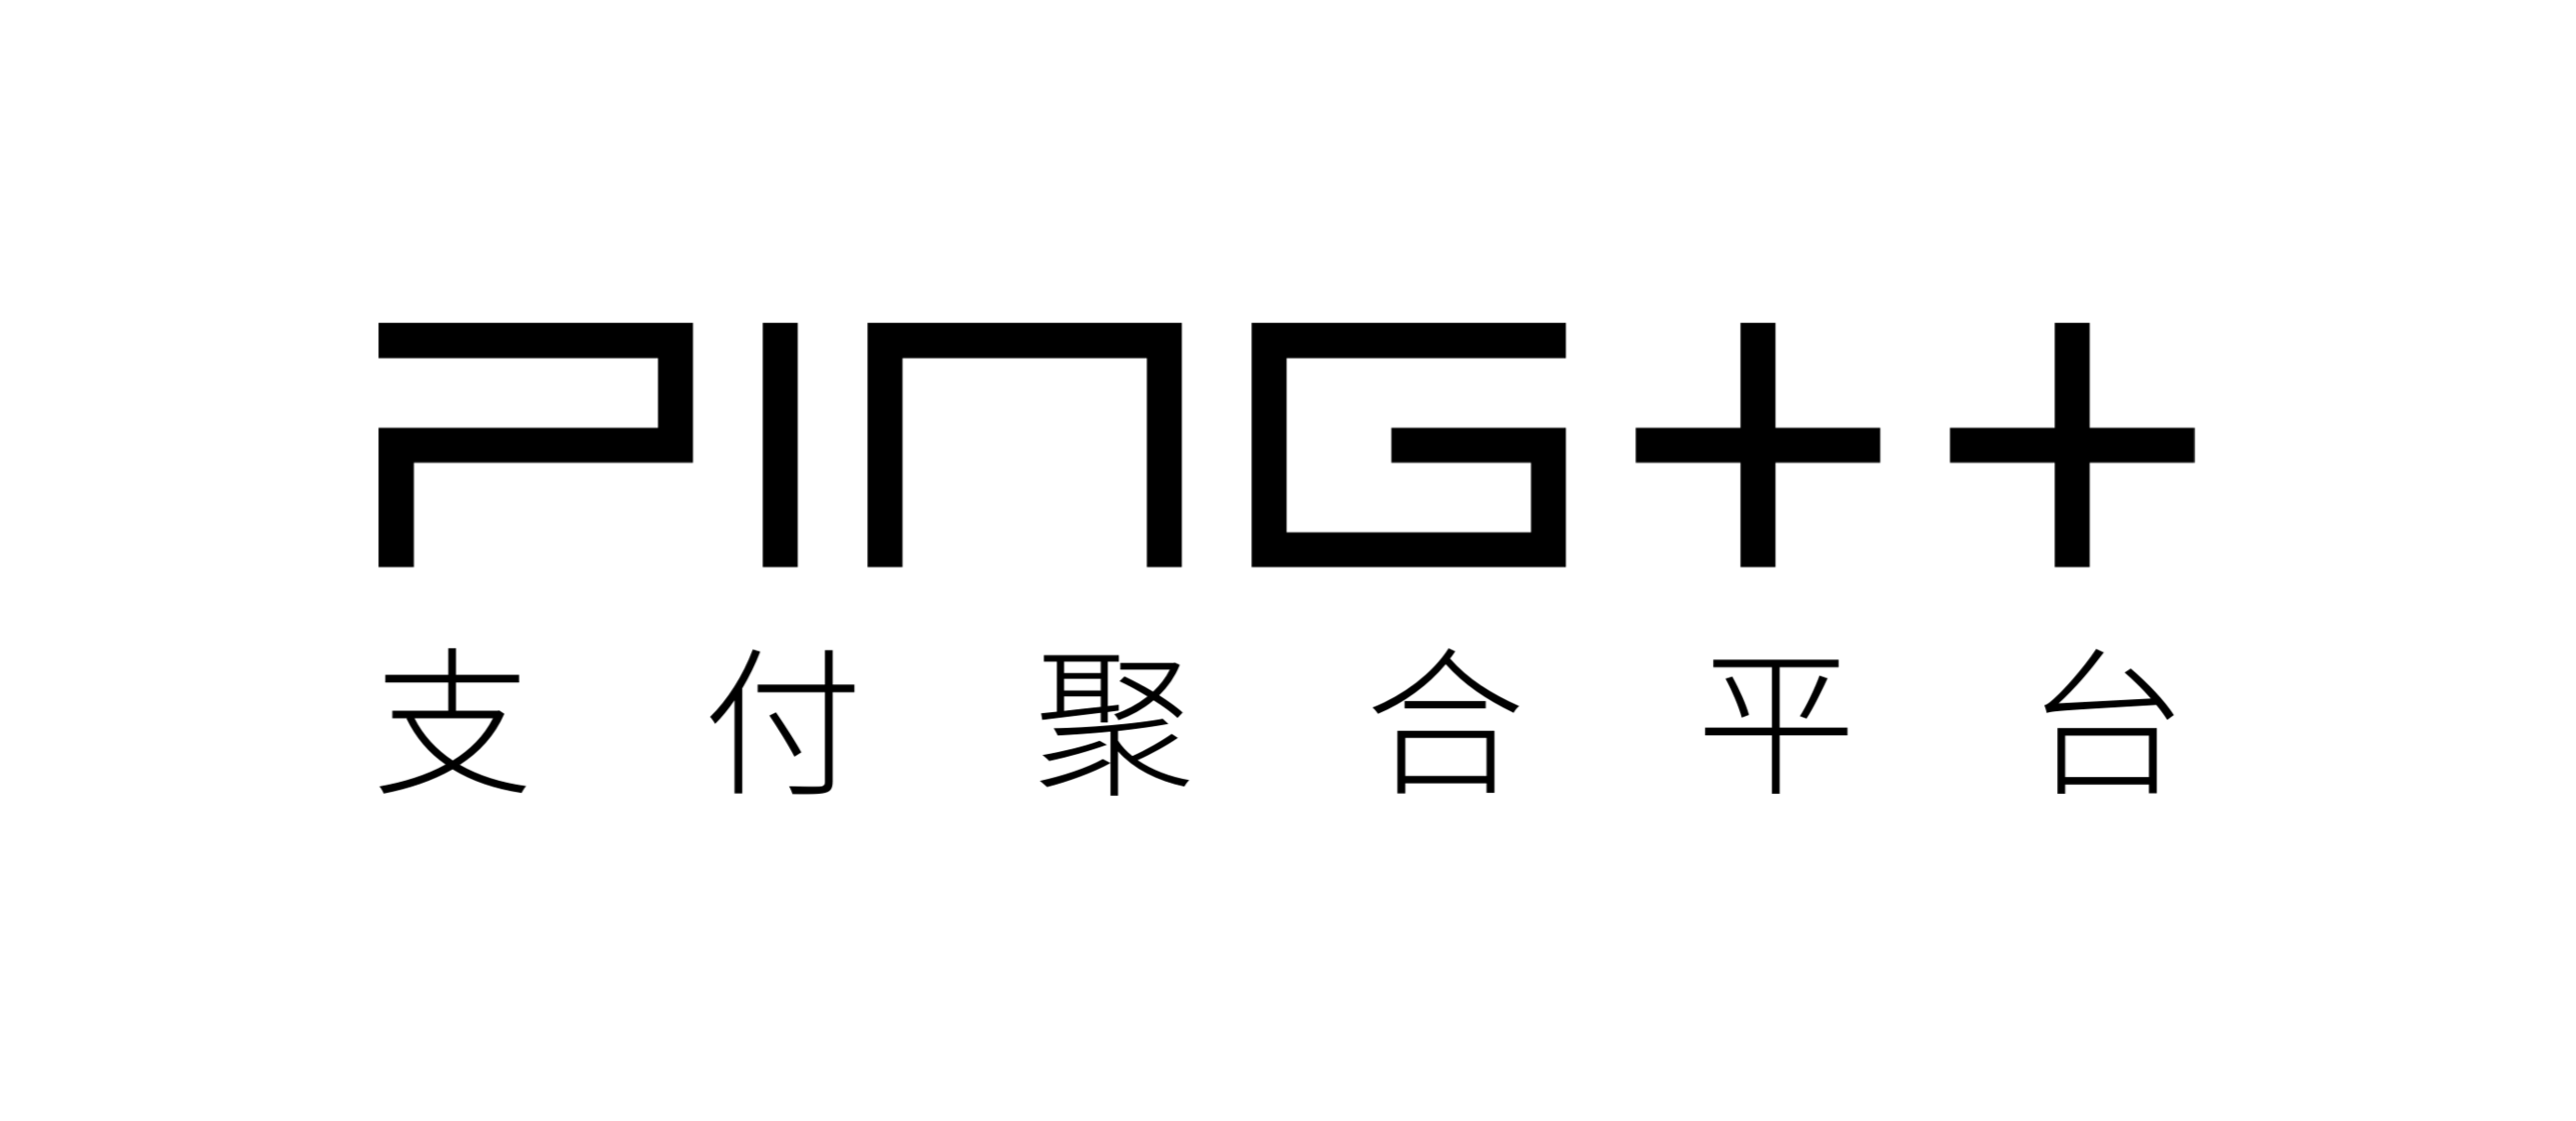 PingPlusPlus/Ping++/简米网络logo